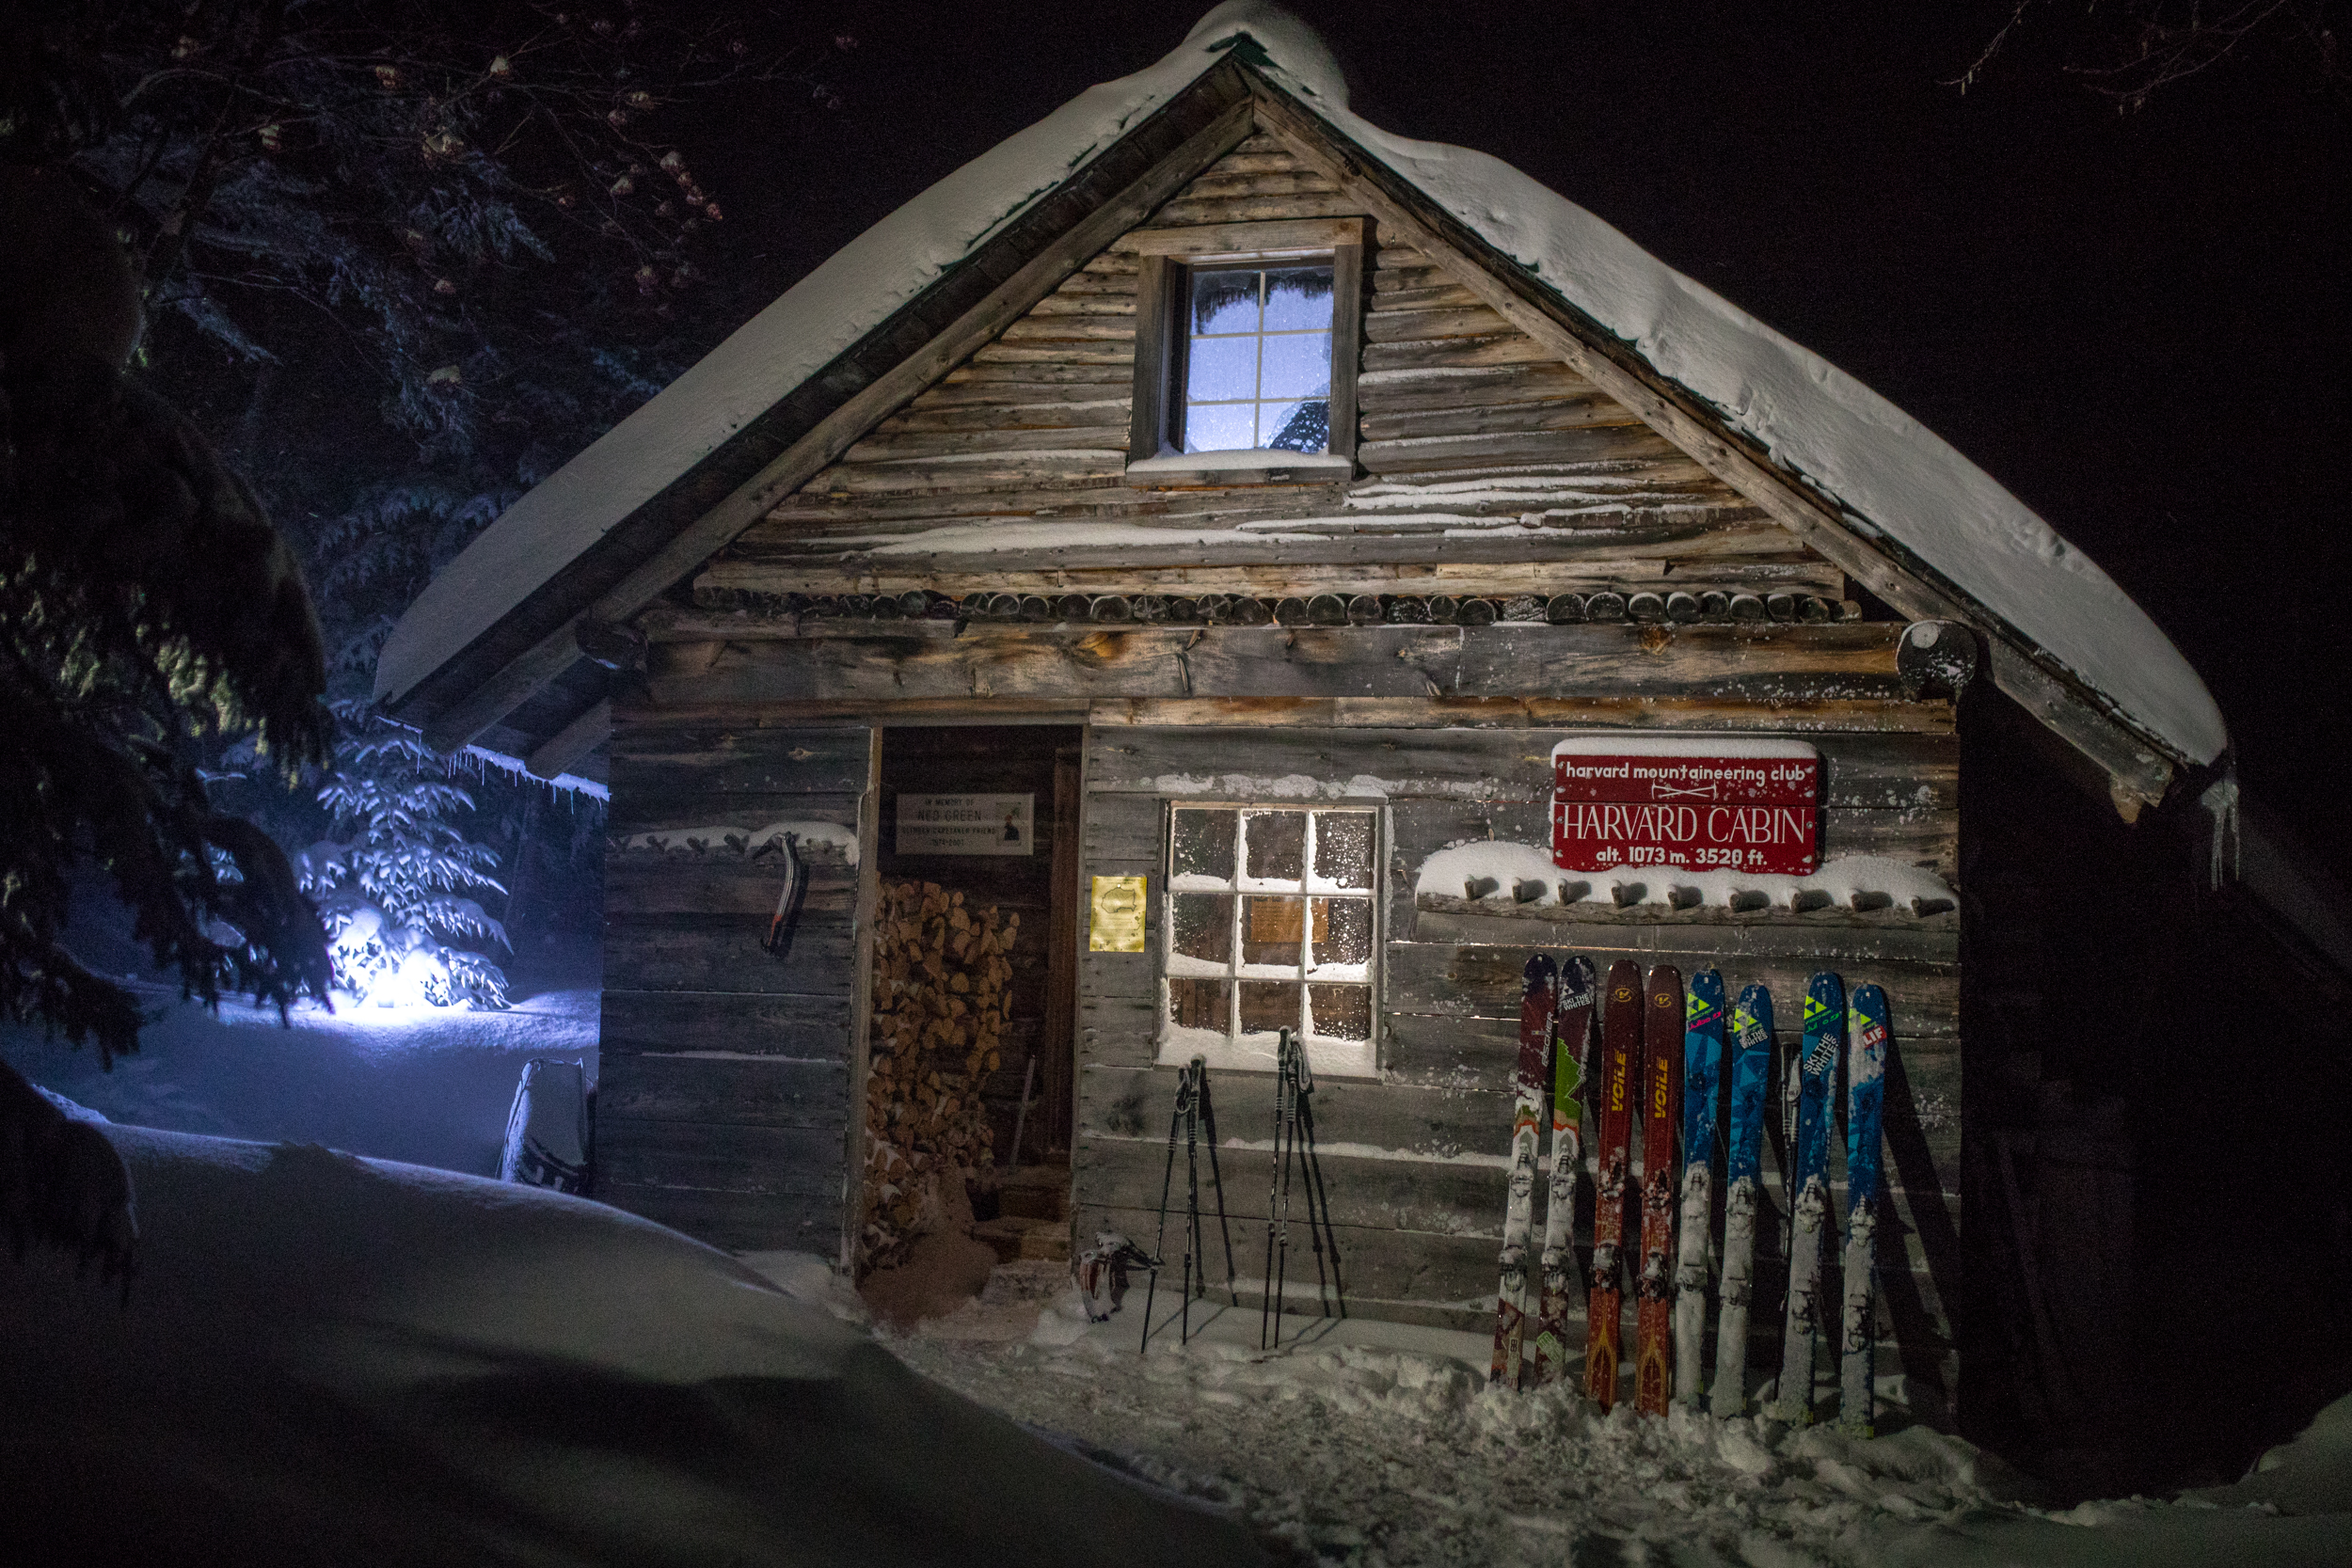 Harvard Cabin Huntington Ravine Skis.jpg